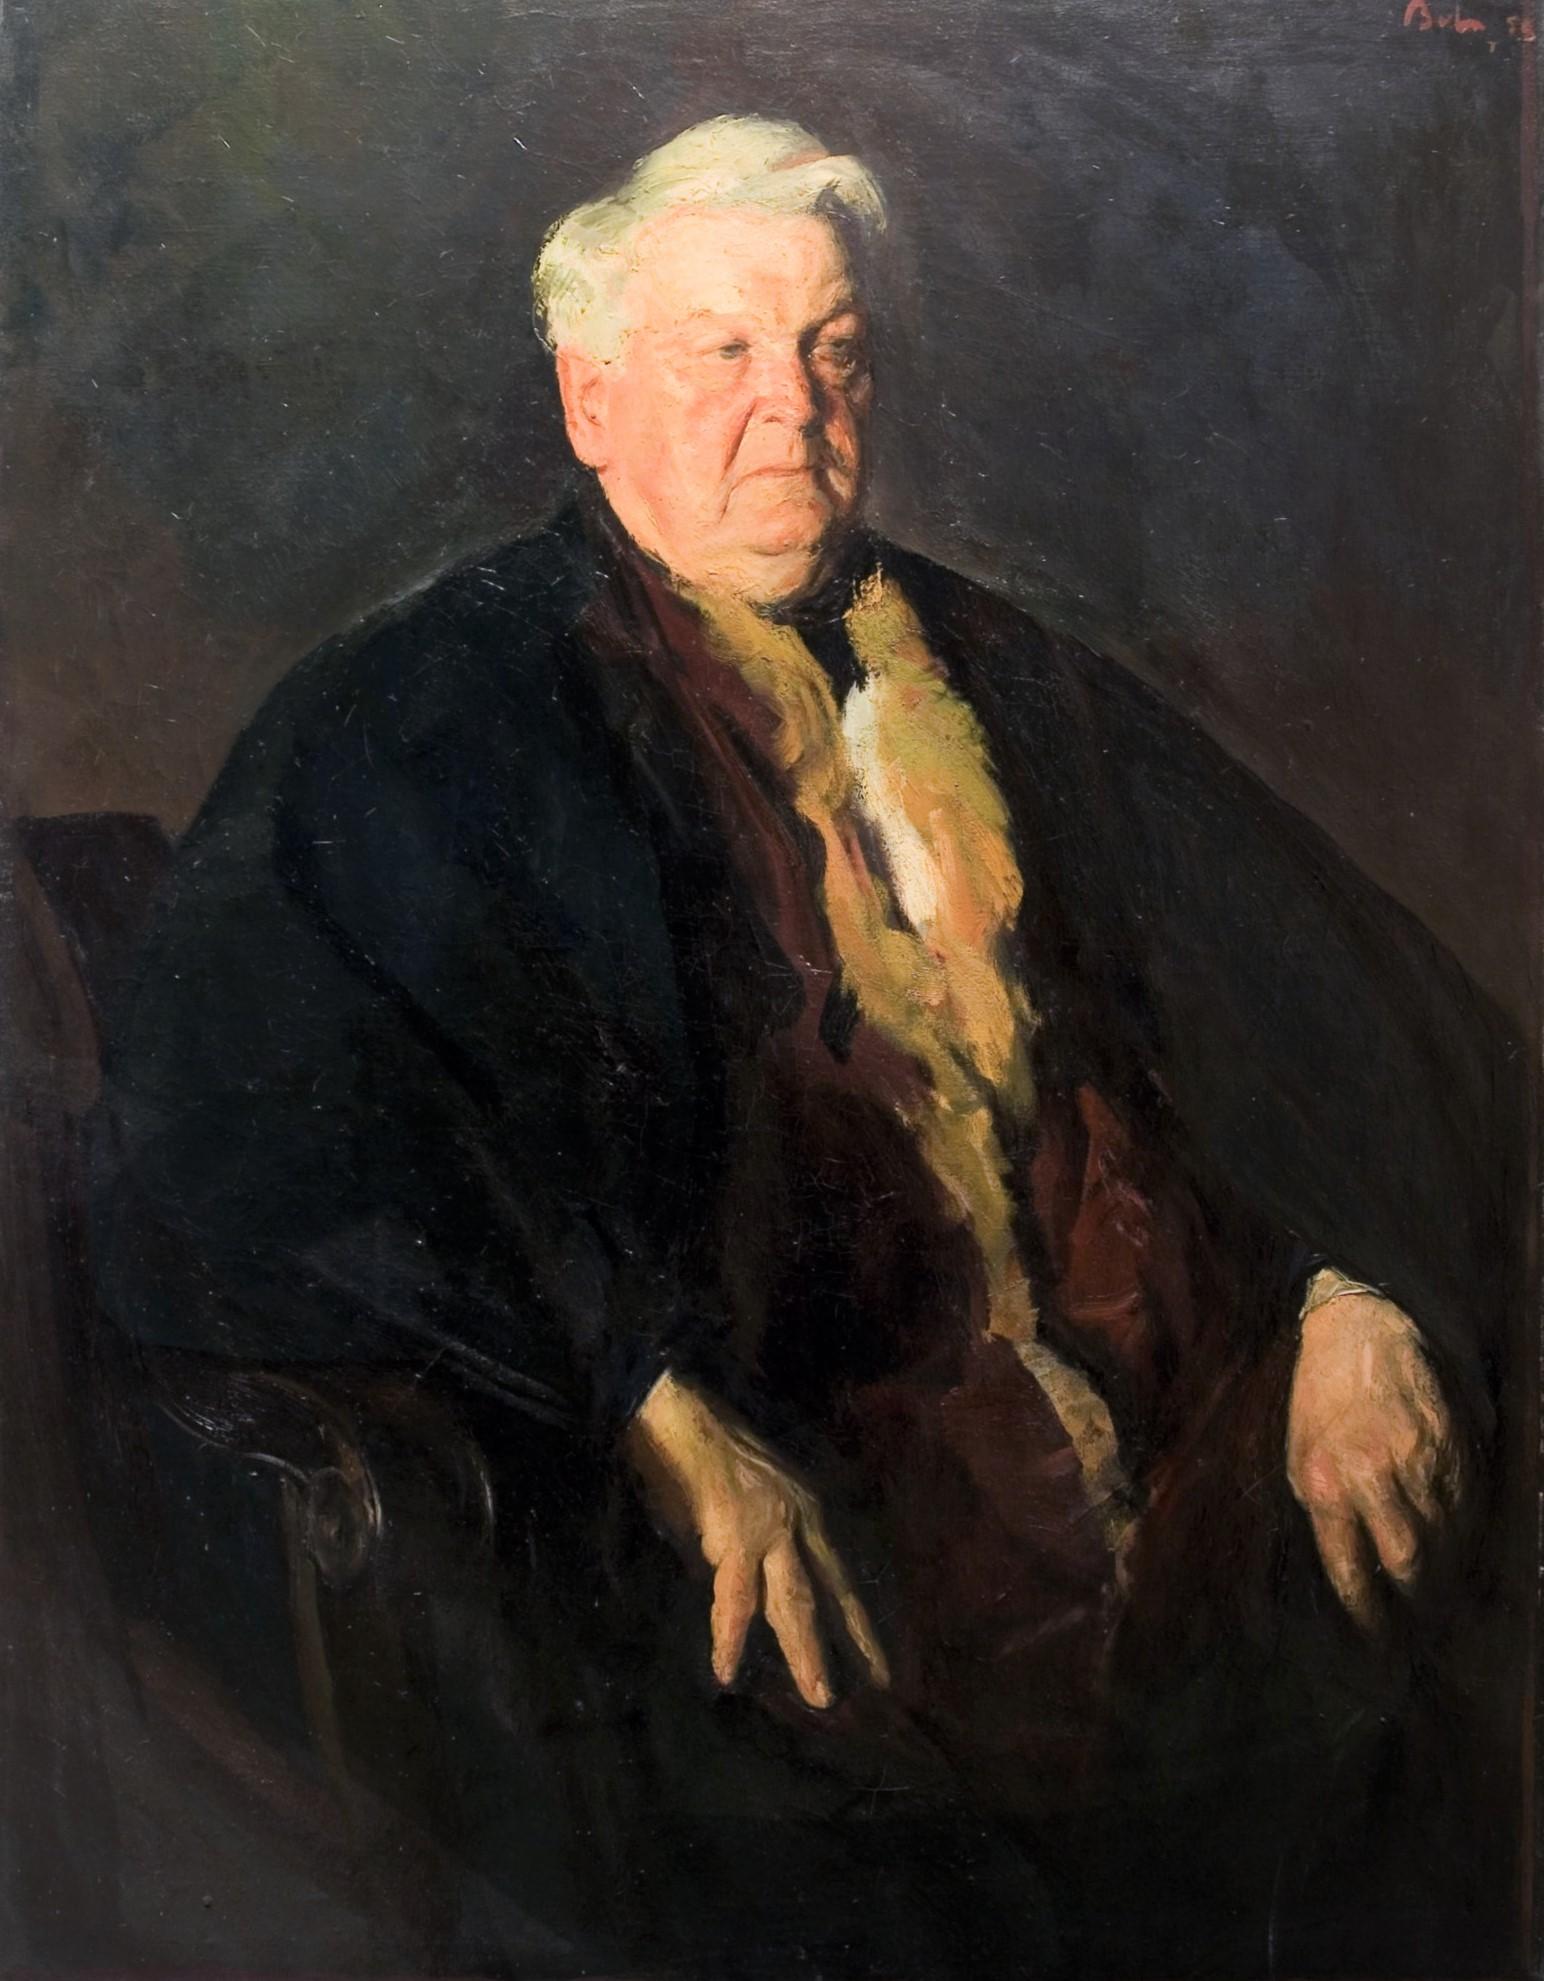 C. Baba - Mihail Sadoveanu - 1956